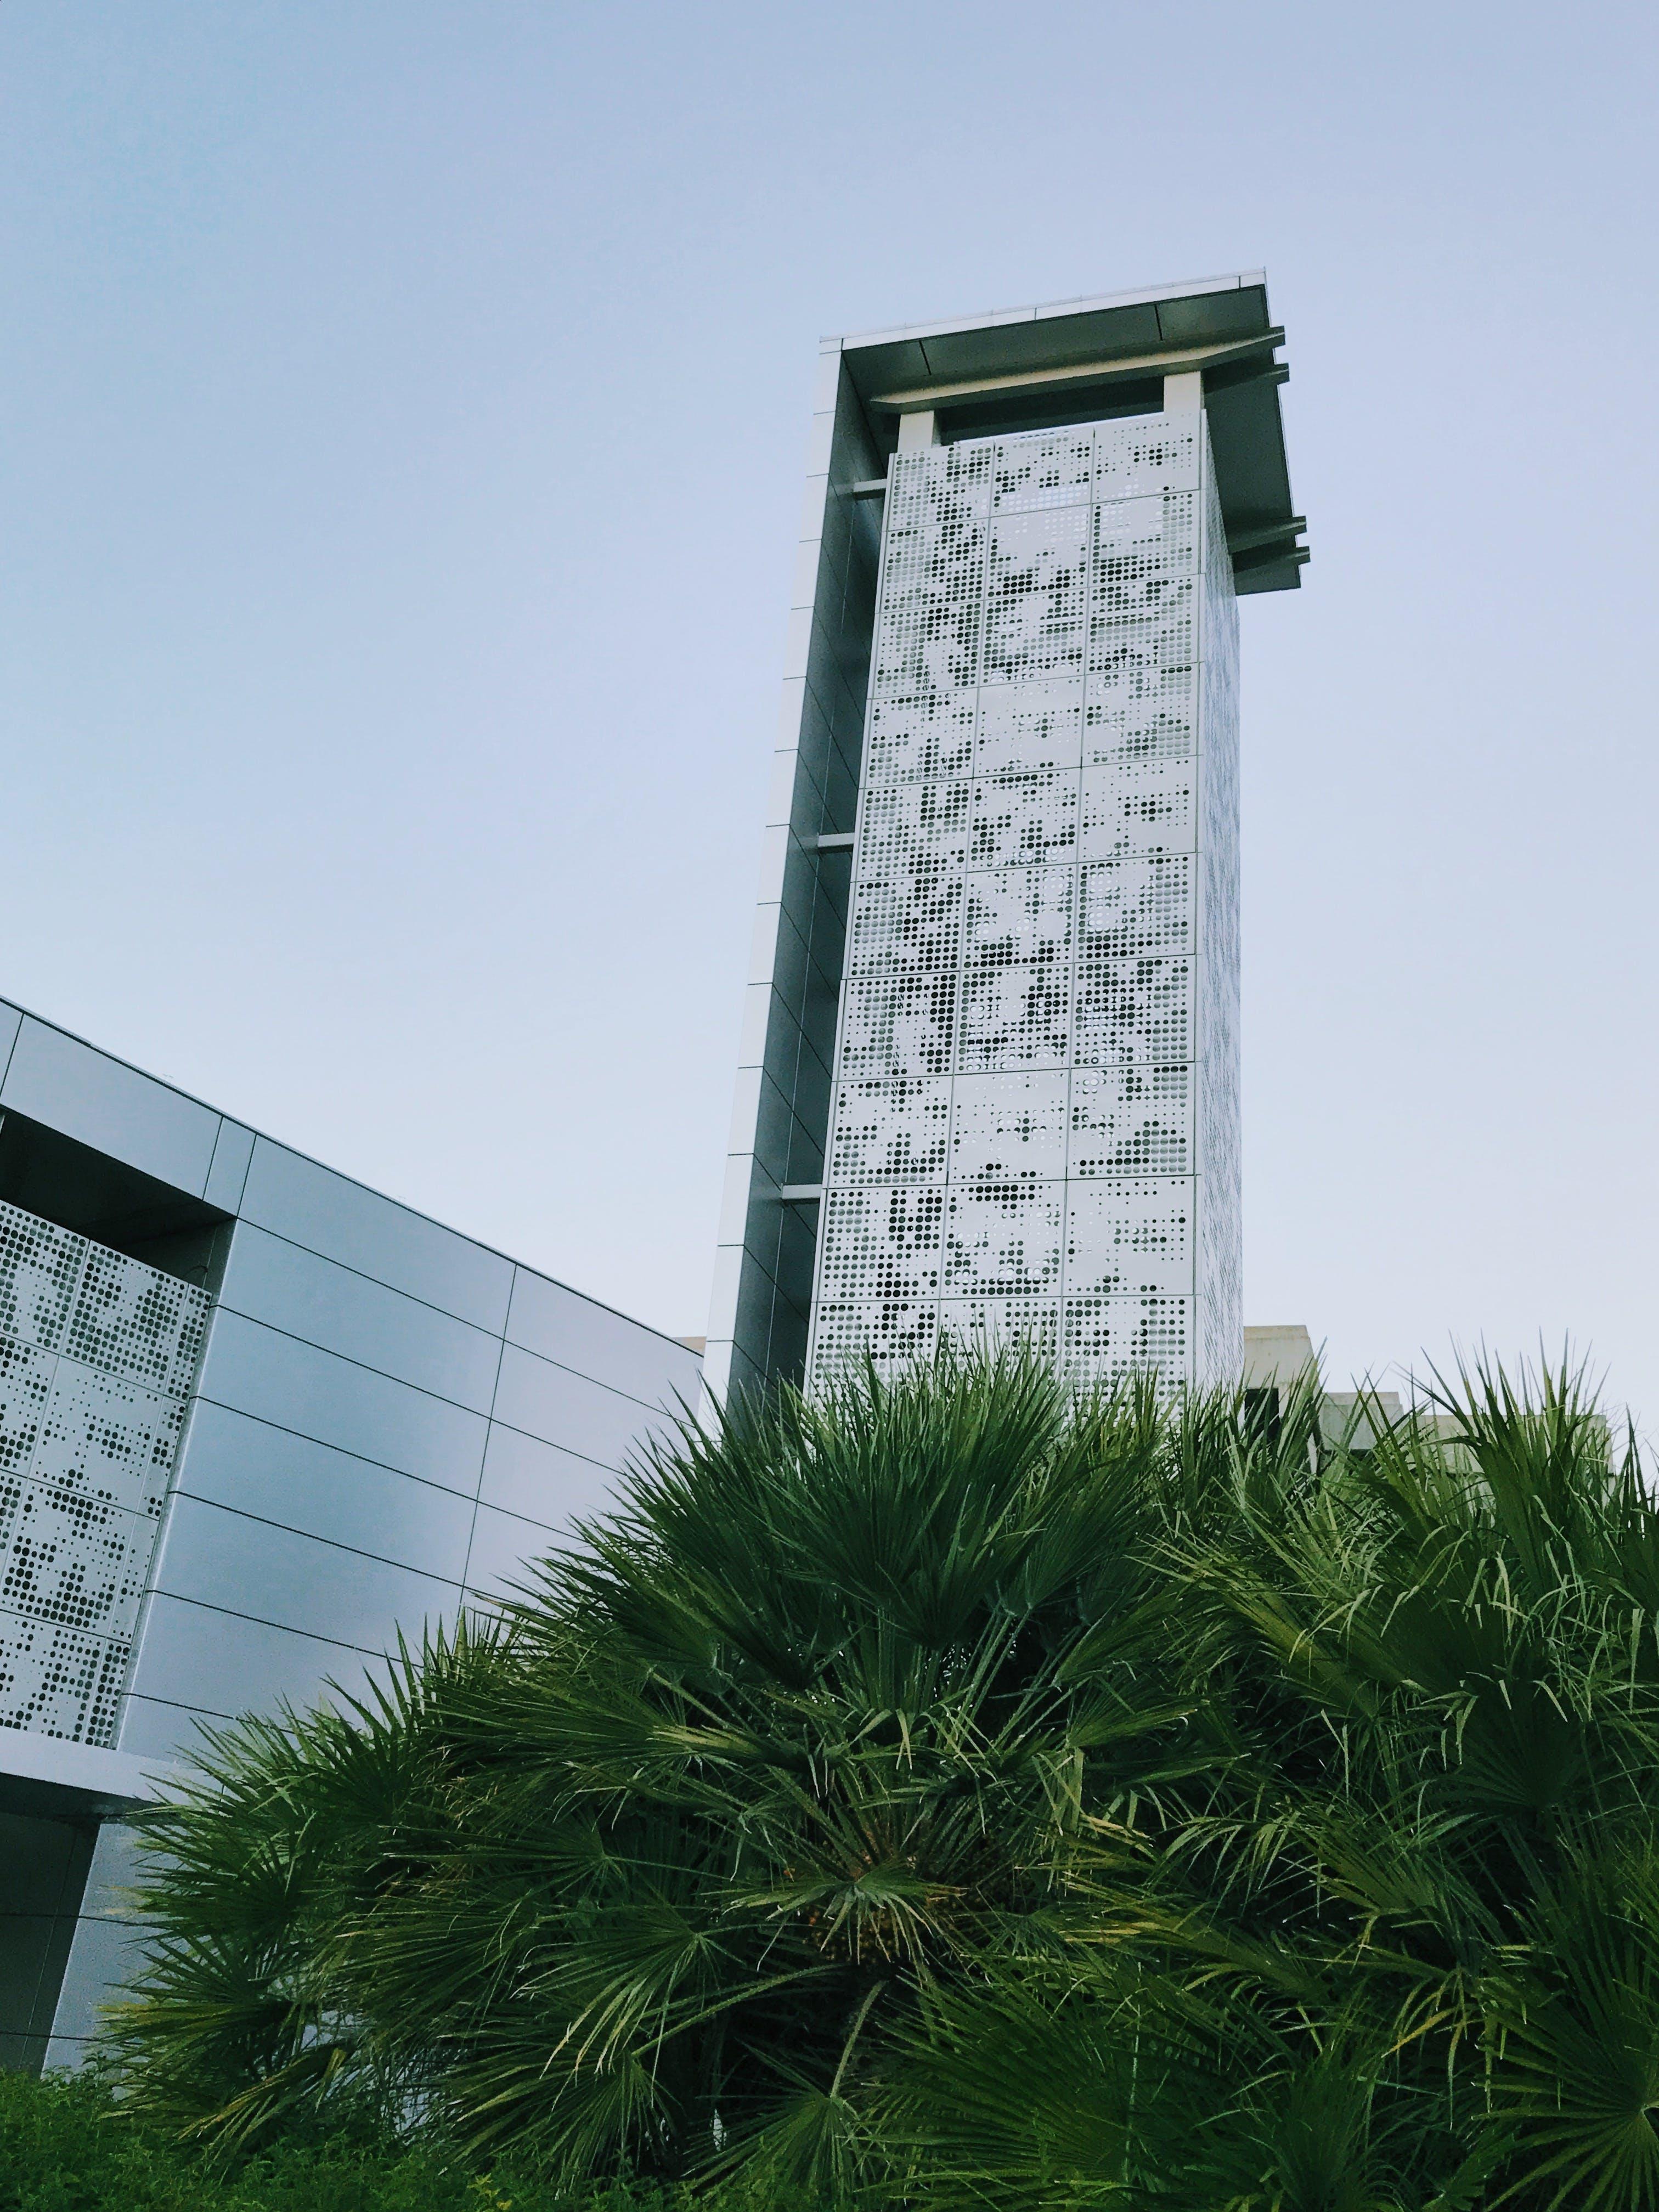 Free stock photo of architecture, blue, building, bush